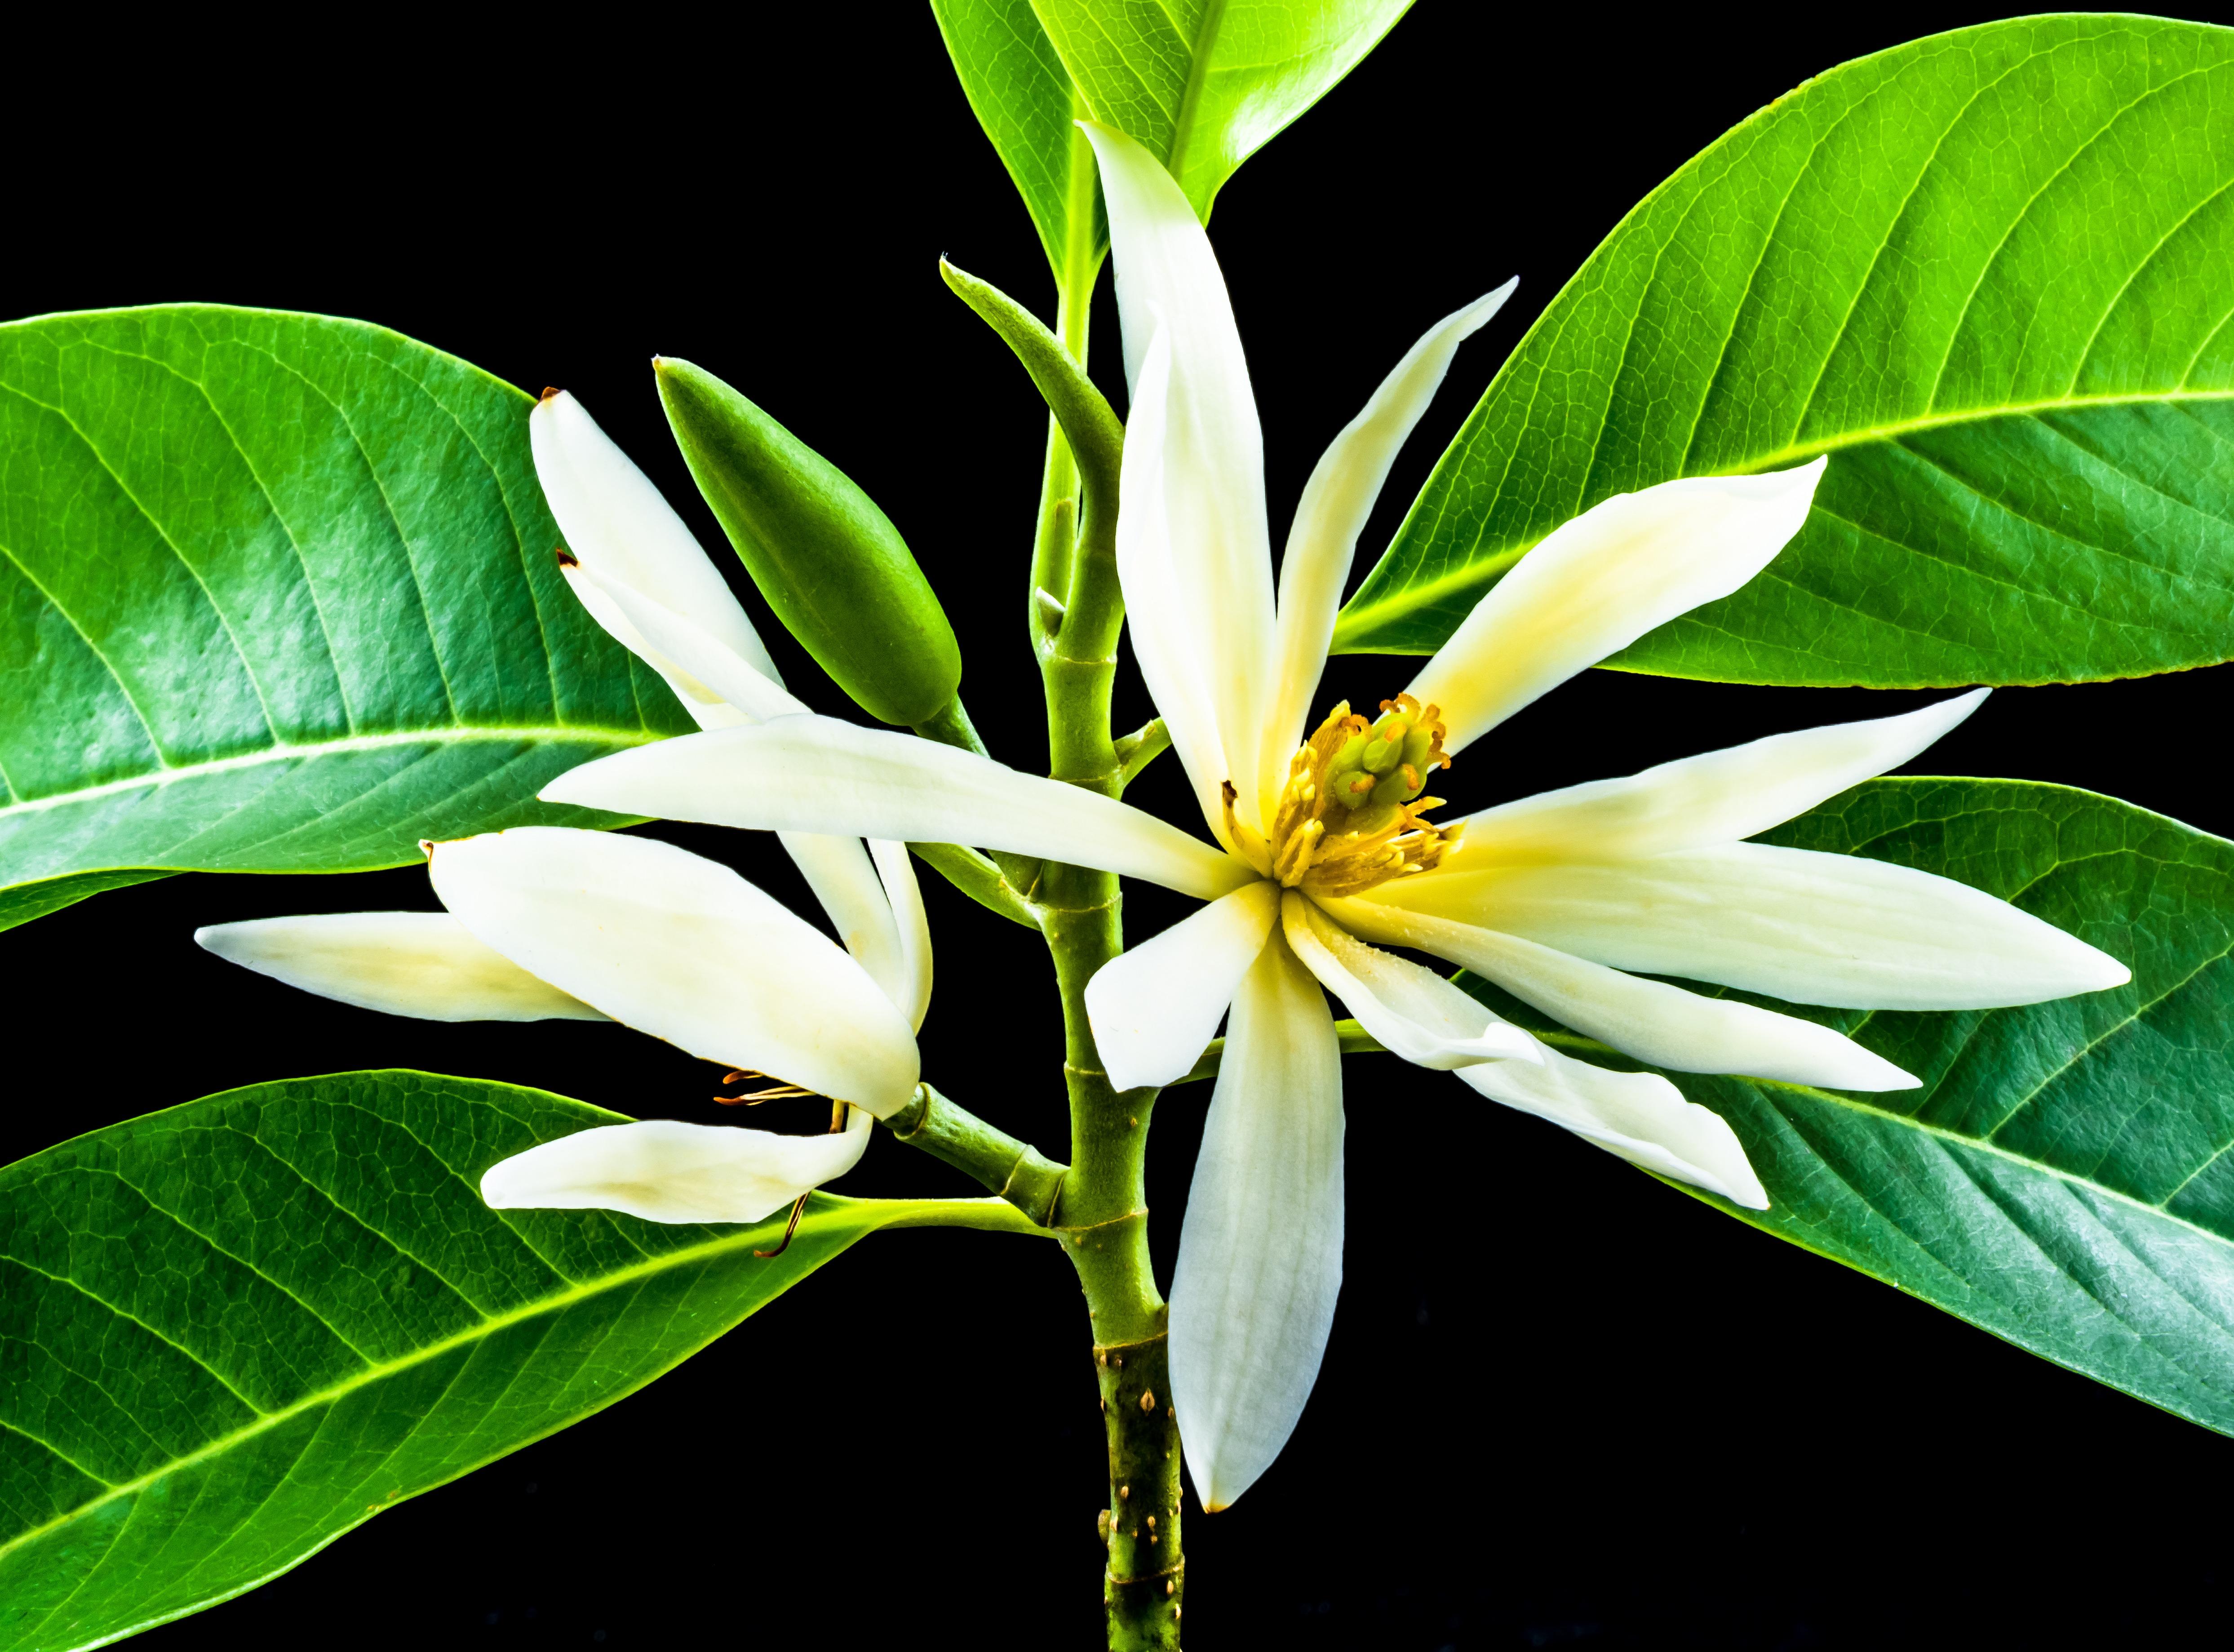 Bunga Cempaka Putih Free Image